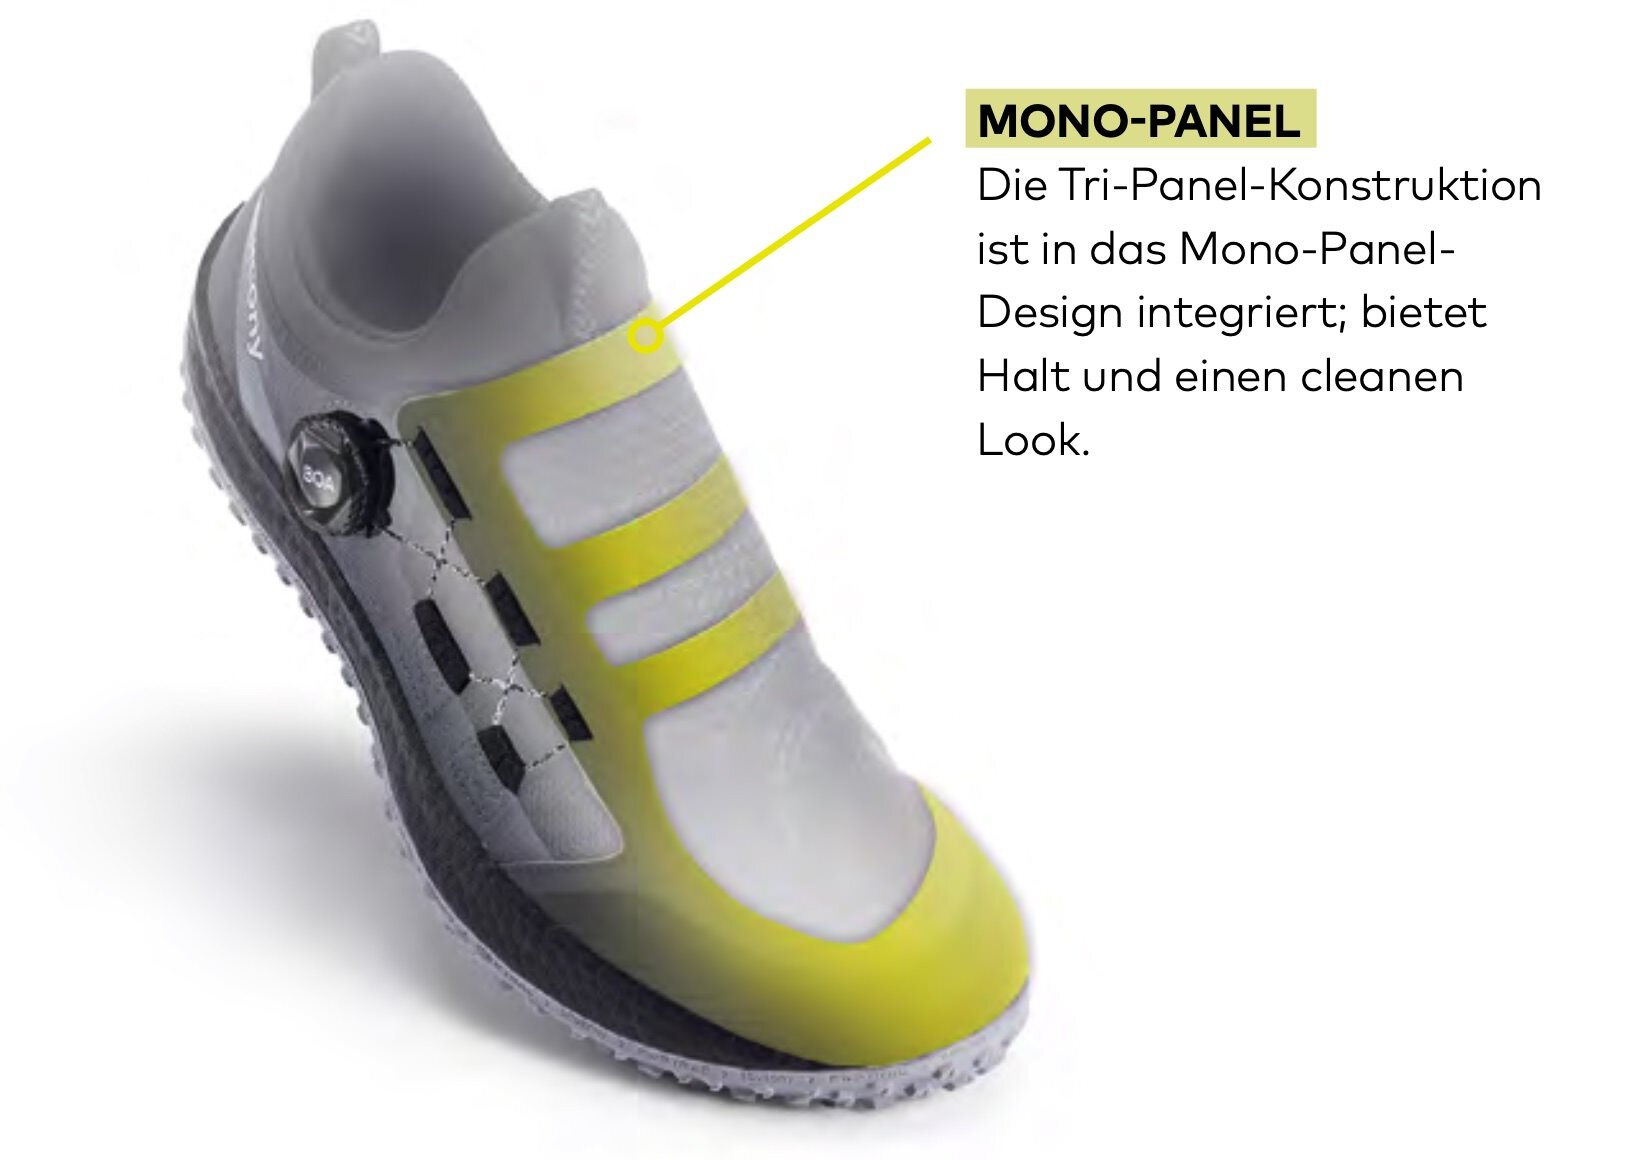 Boa-Fit-System-Mono-Panel